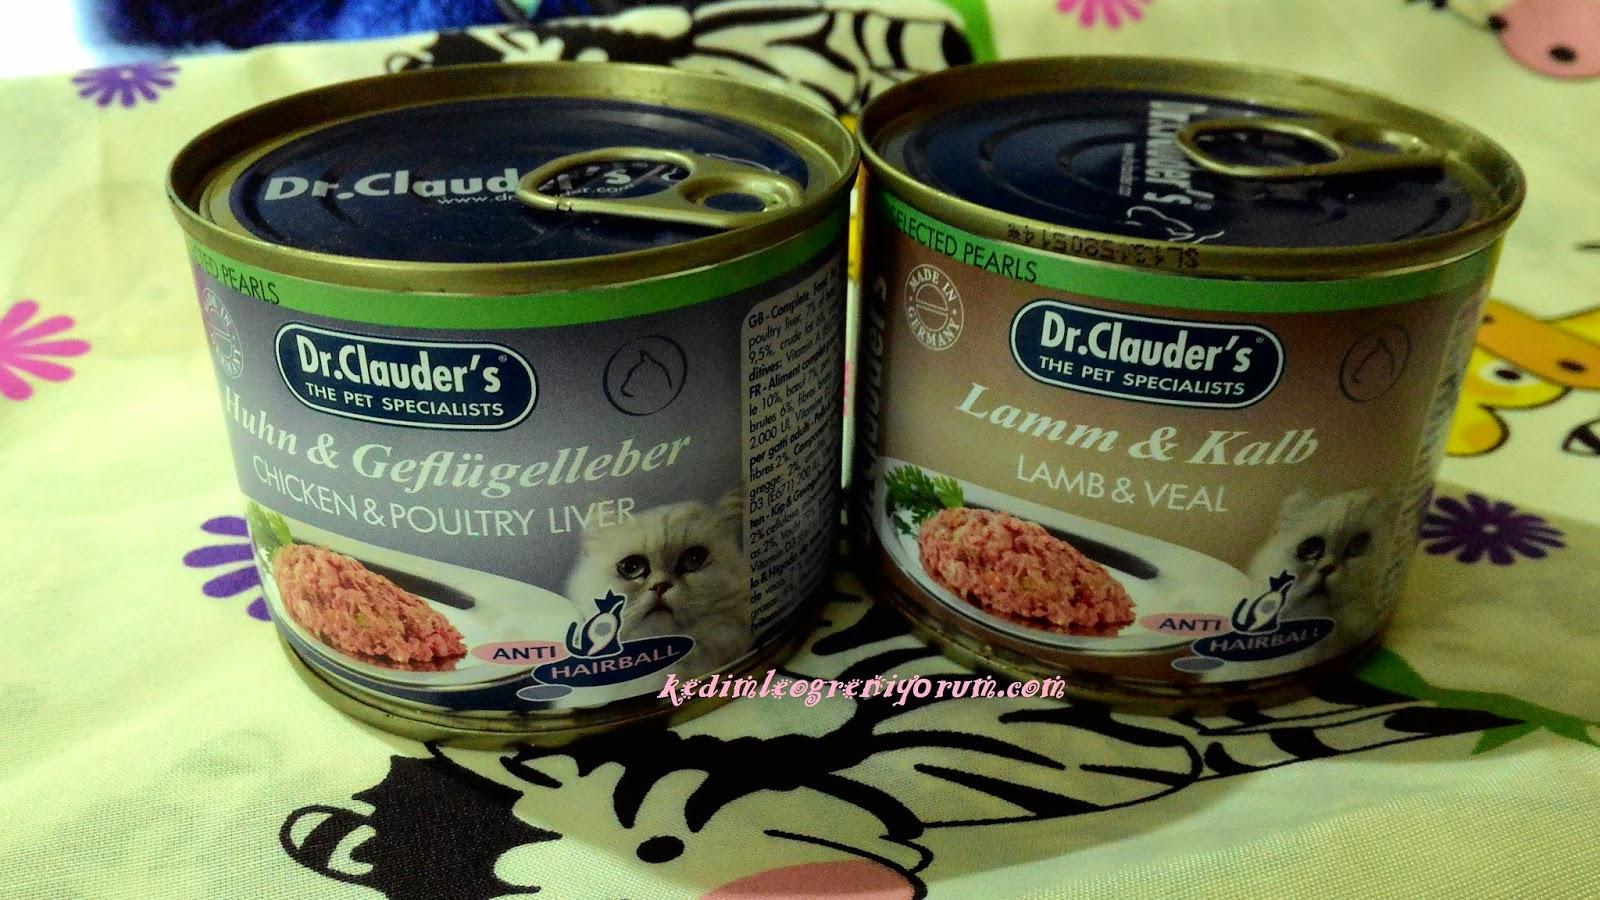 Dr.Clauder's Tüy Yumağı Önleyici Yaş Mamaları